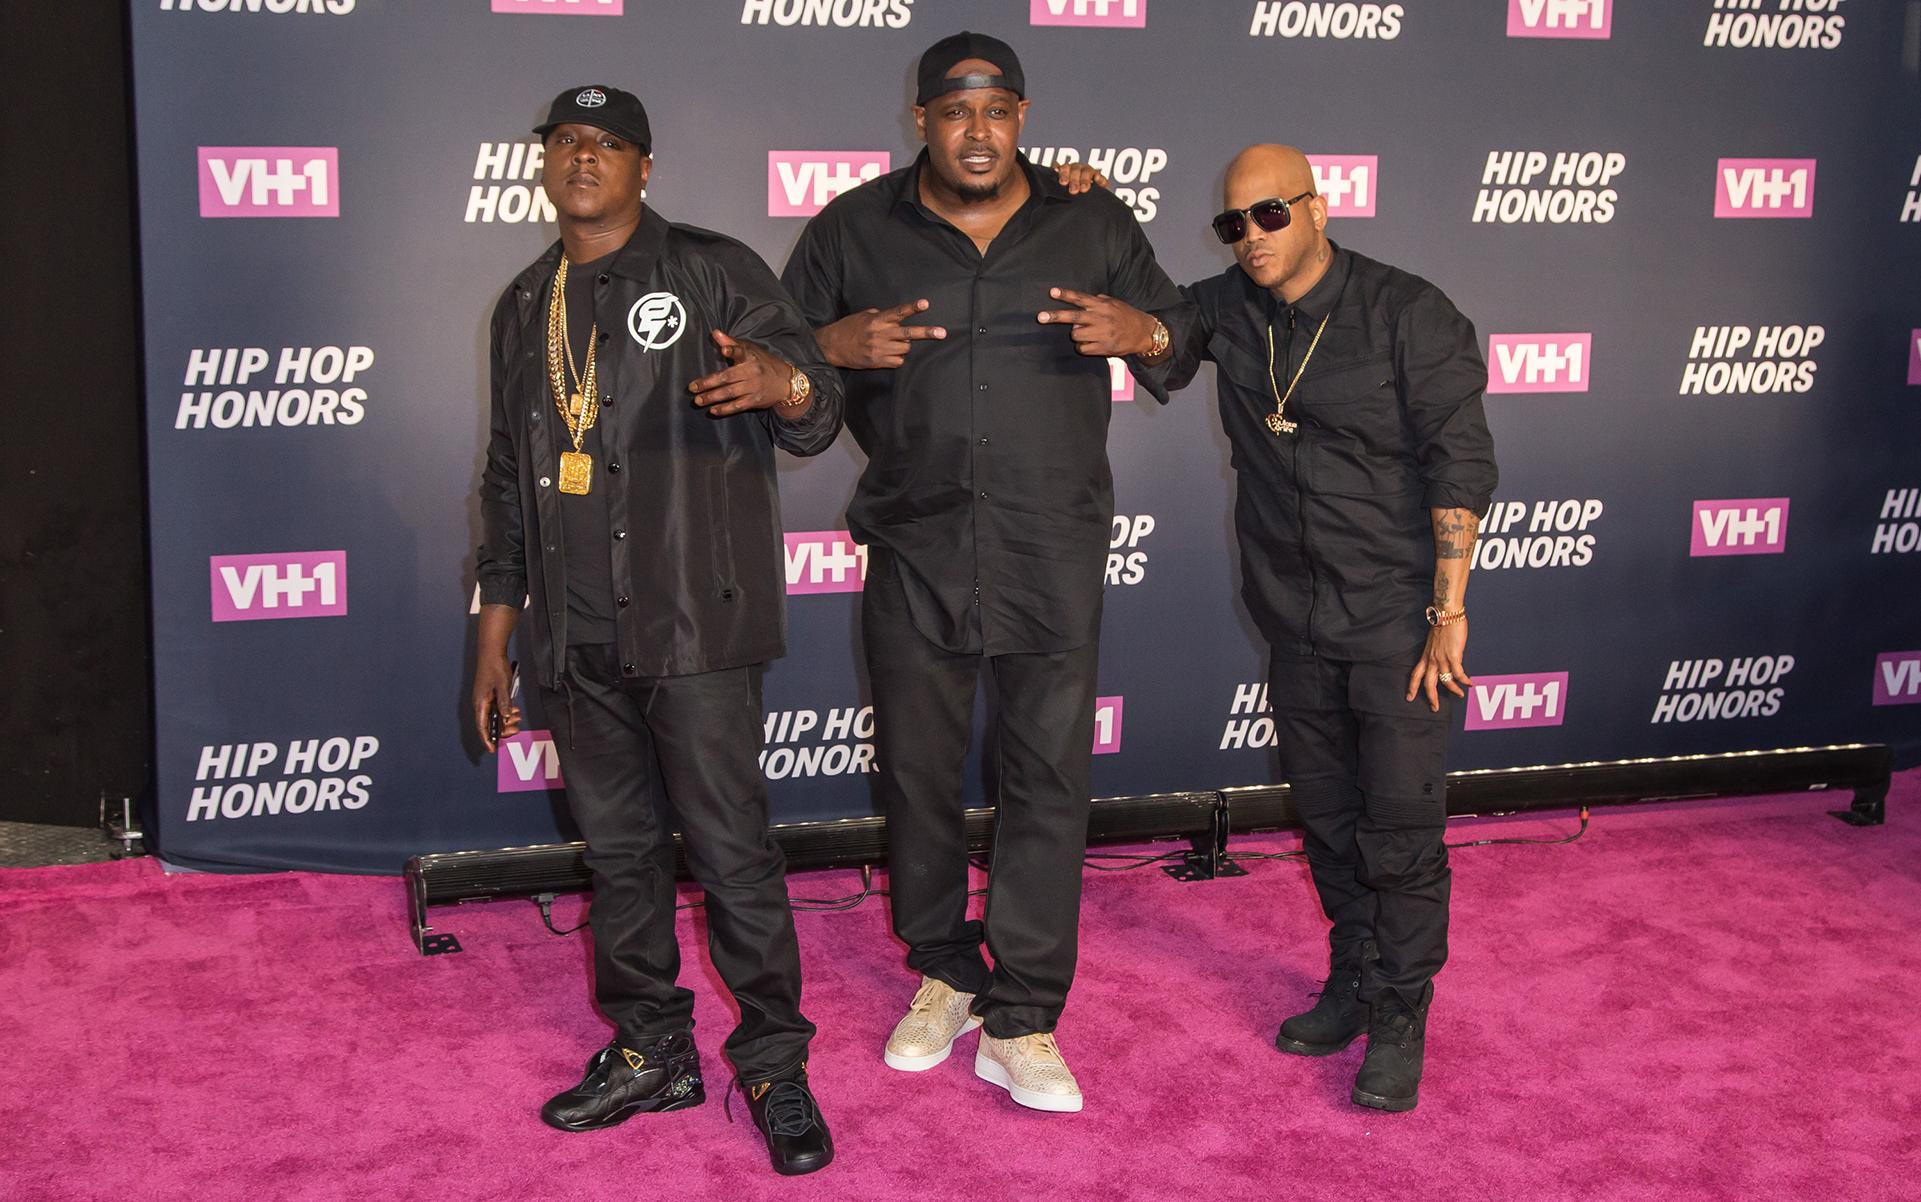 Hip hop group The Lox